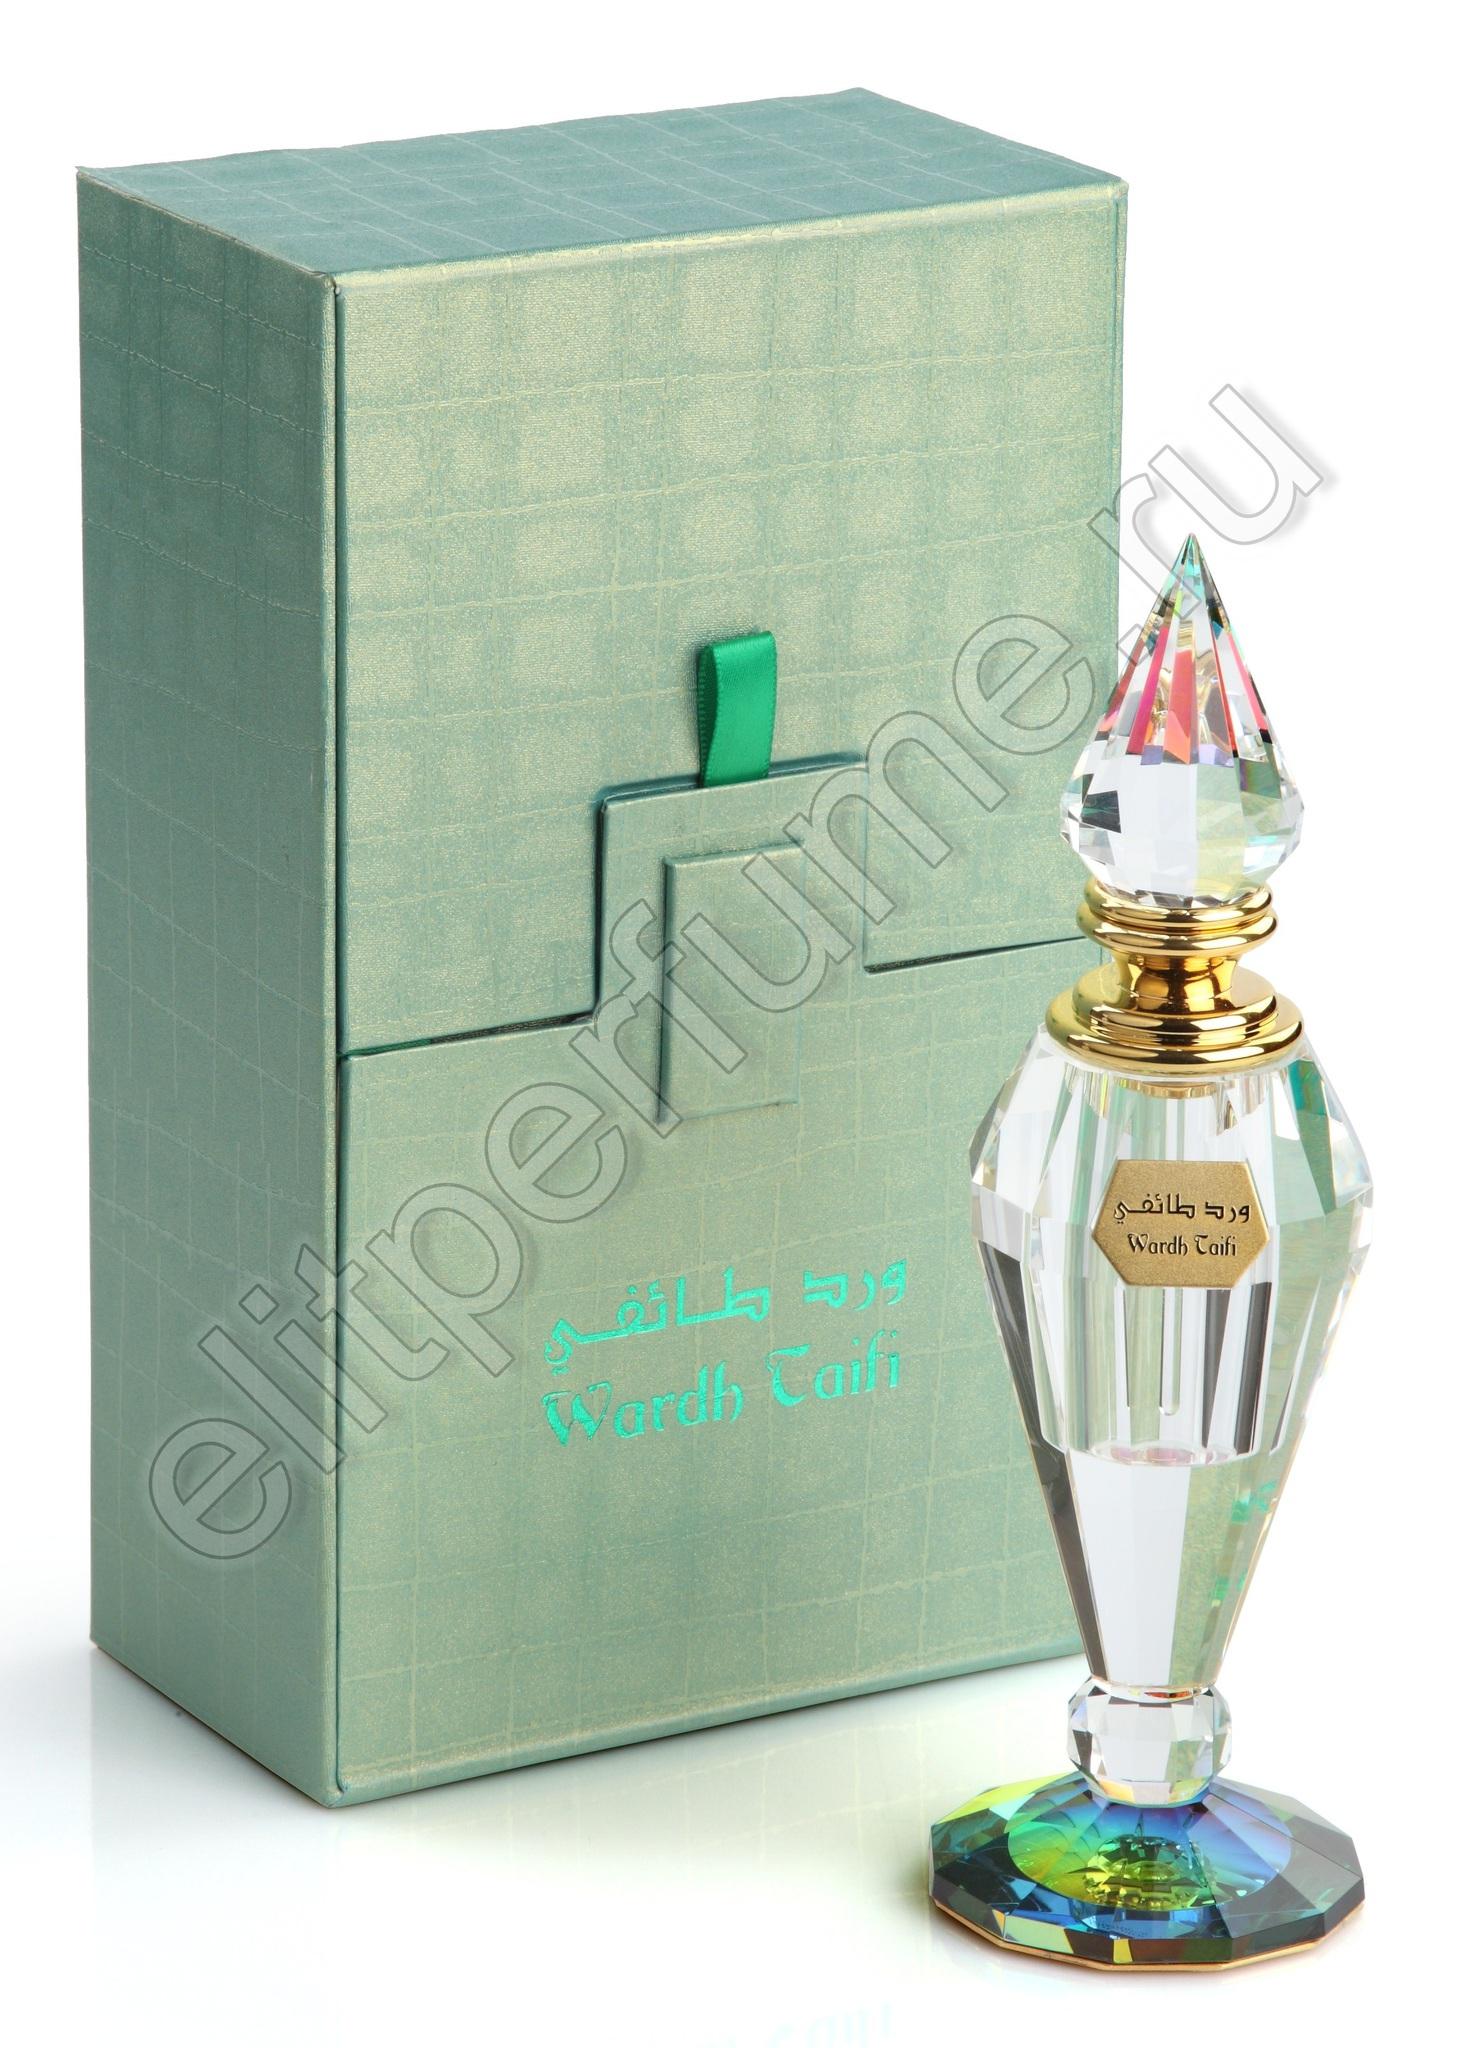 Уард Таифи Wardh Taifi 12 мл арабские масляные духи от Аль Харамайн Al Haramain Perfumes